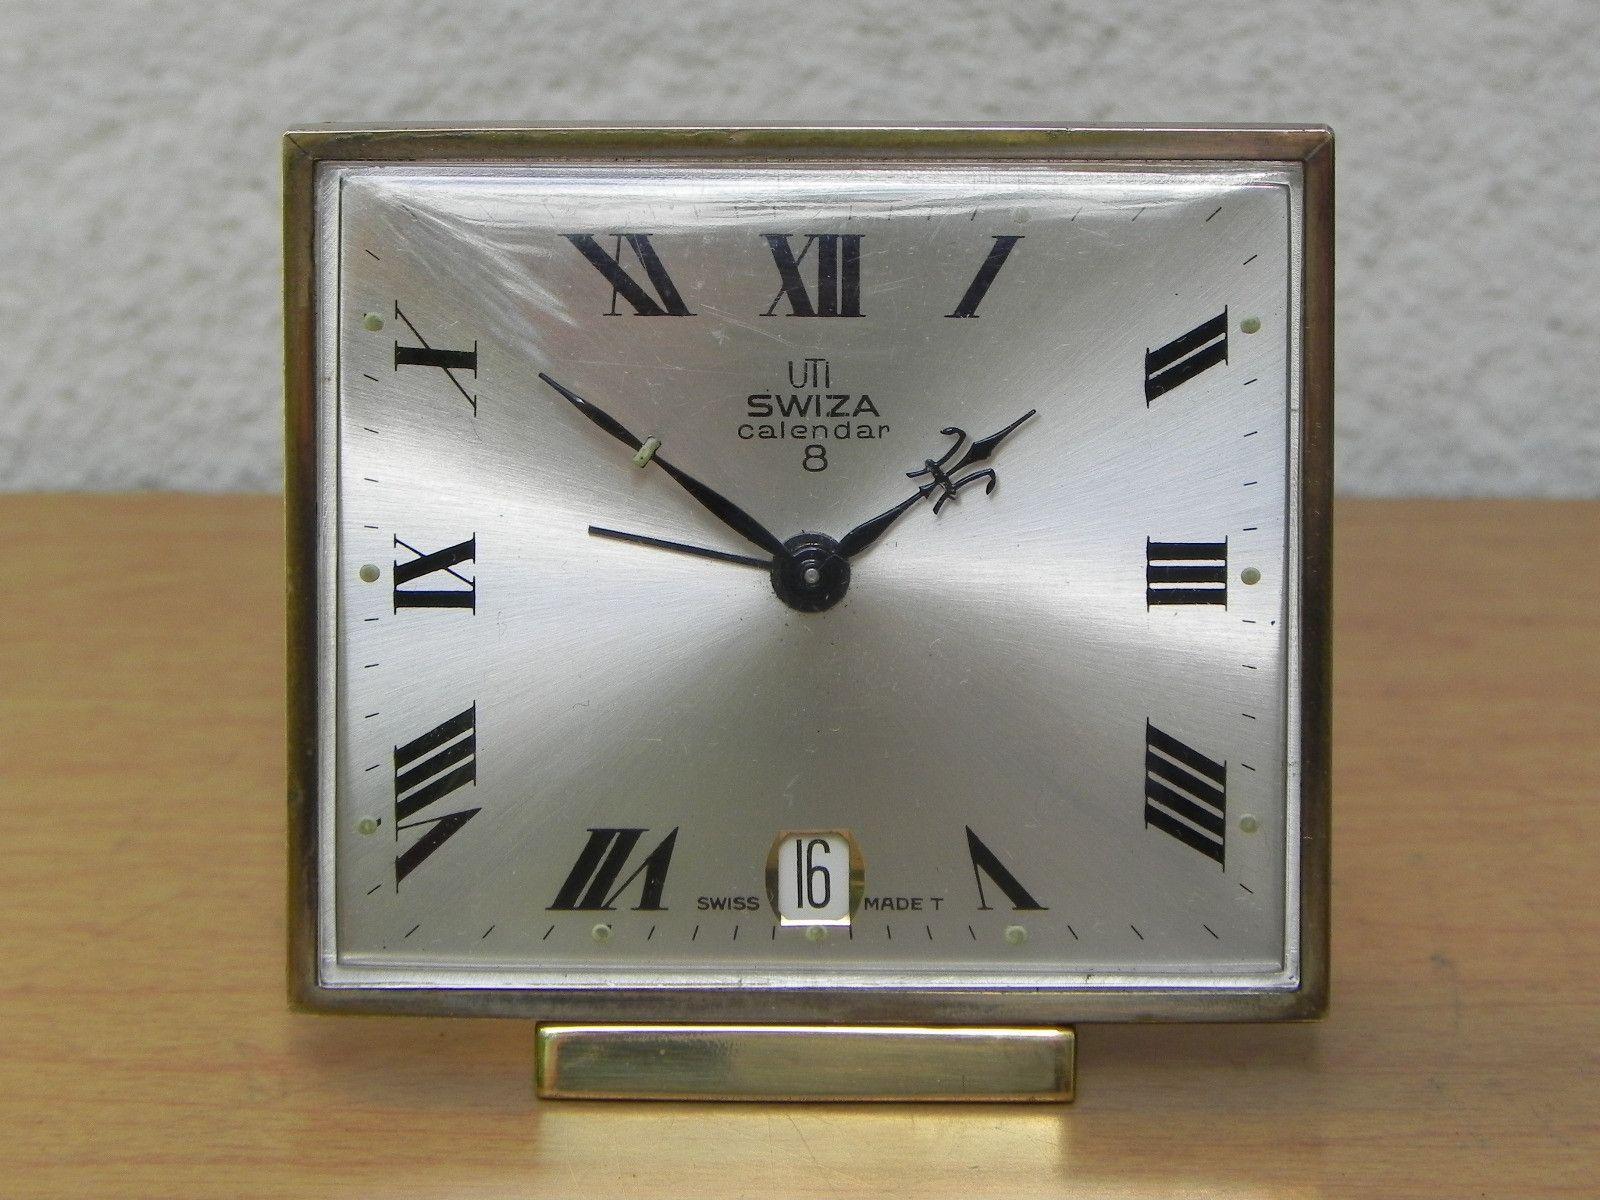 Calendar Clock Wallpaper : Small square swiza 8 day calendar alarm clock with date clocks